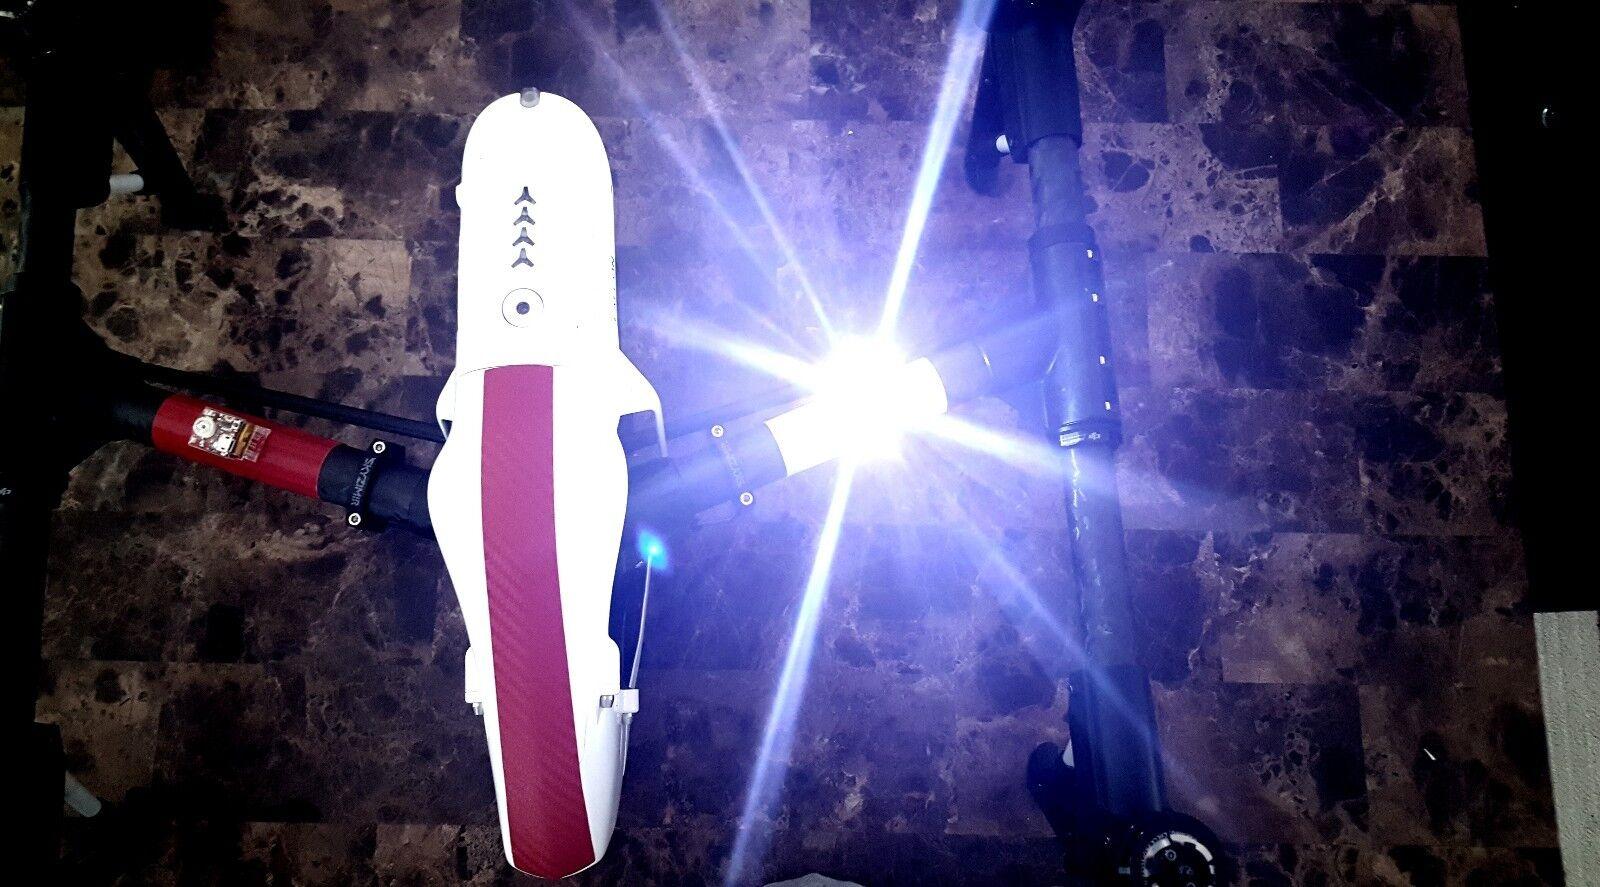 DRONE CREE DUAL BLUE STROBE LIGHT W/ BATT FAA 107 DJI INSPIRE 1 2 PHANTOM MAVIC